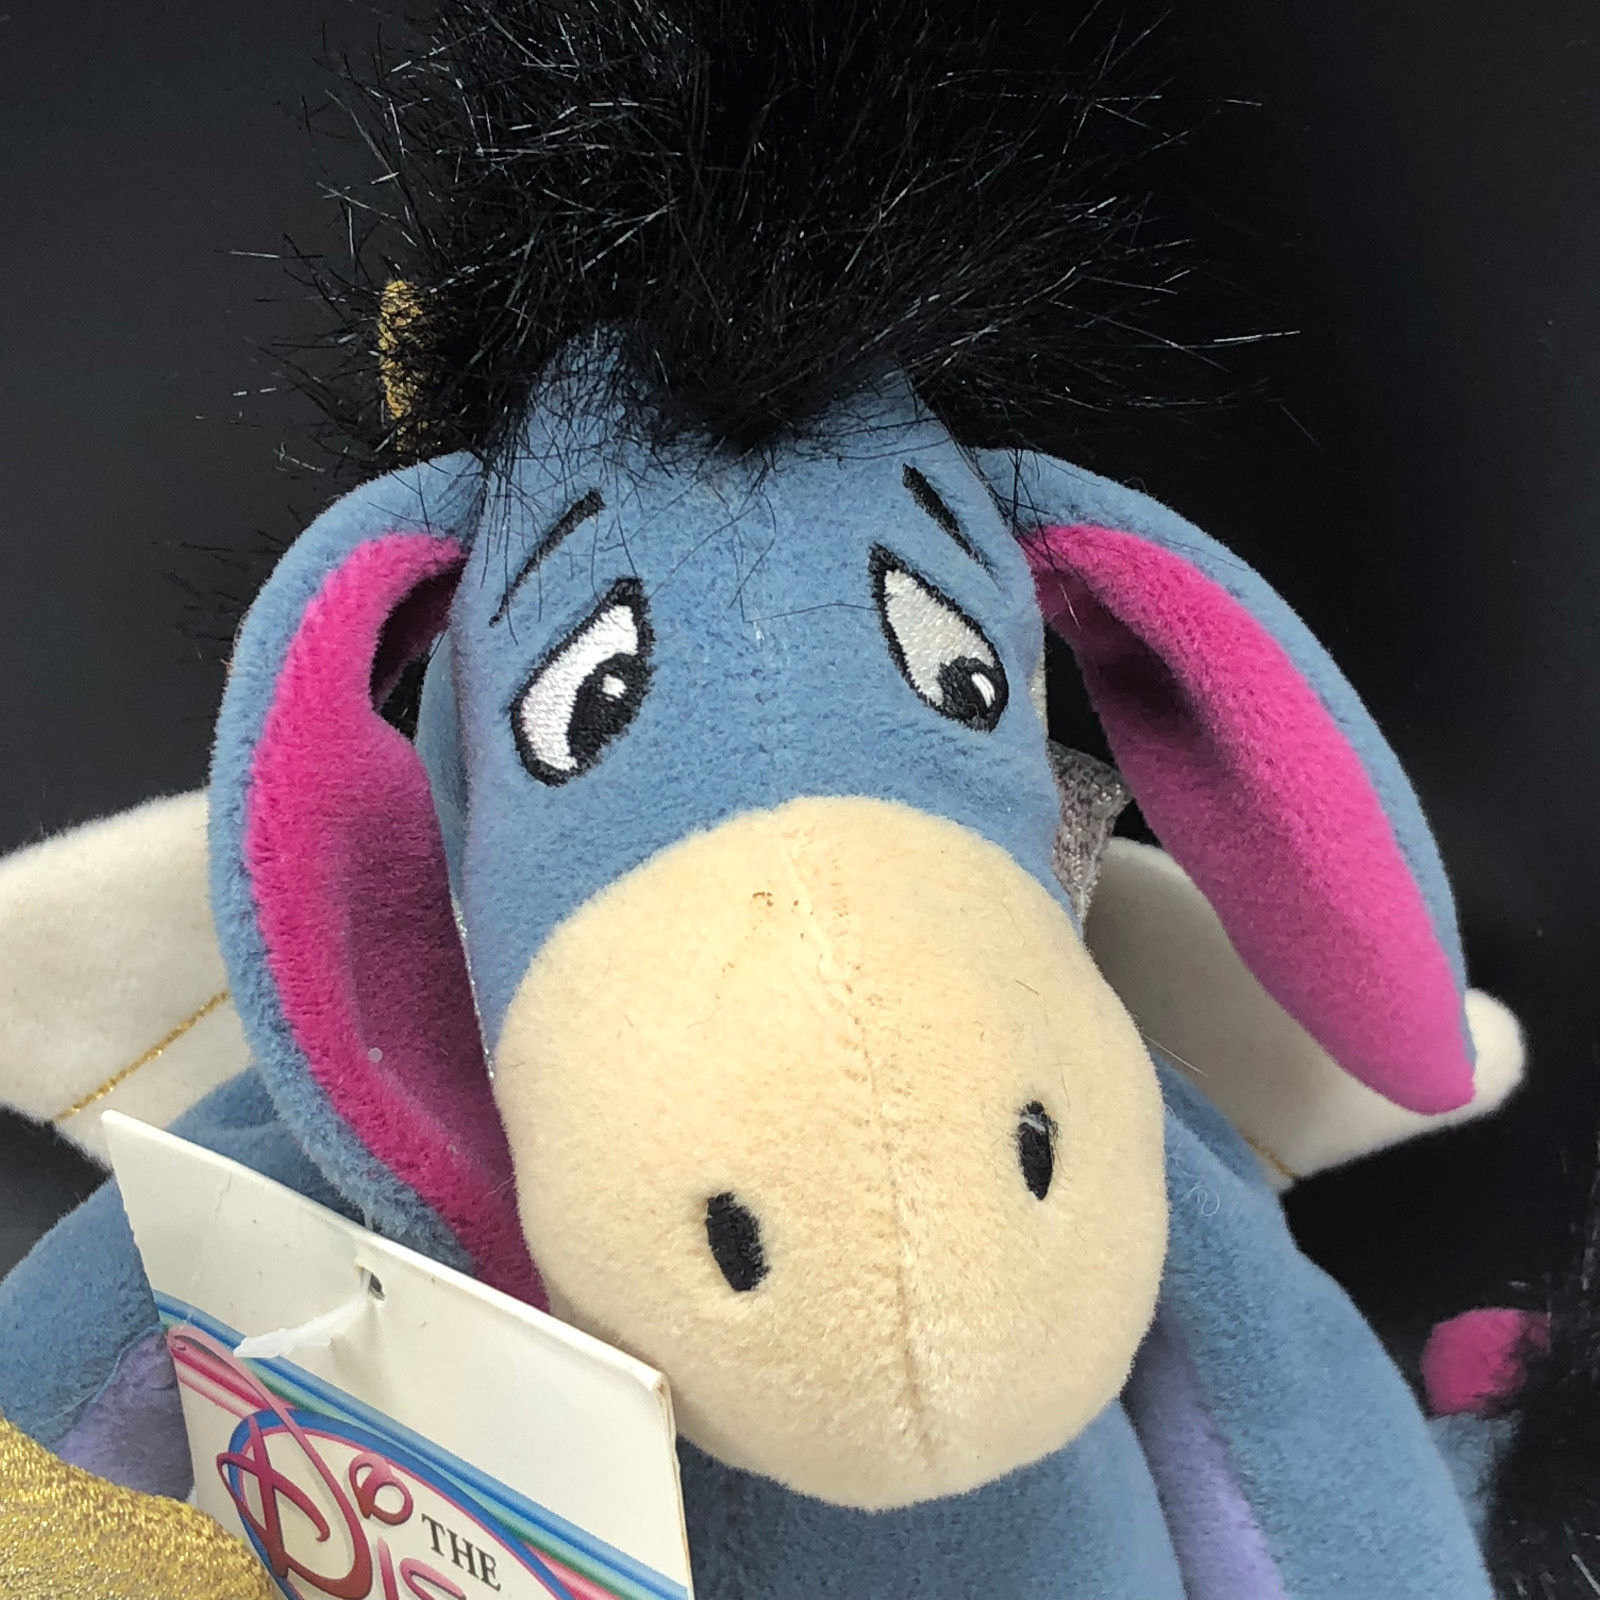 DISNEY STORE PLUSH bean bag stuffed animal Christopher Robin Pooh Eeyore cupid